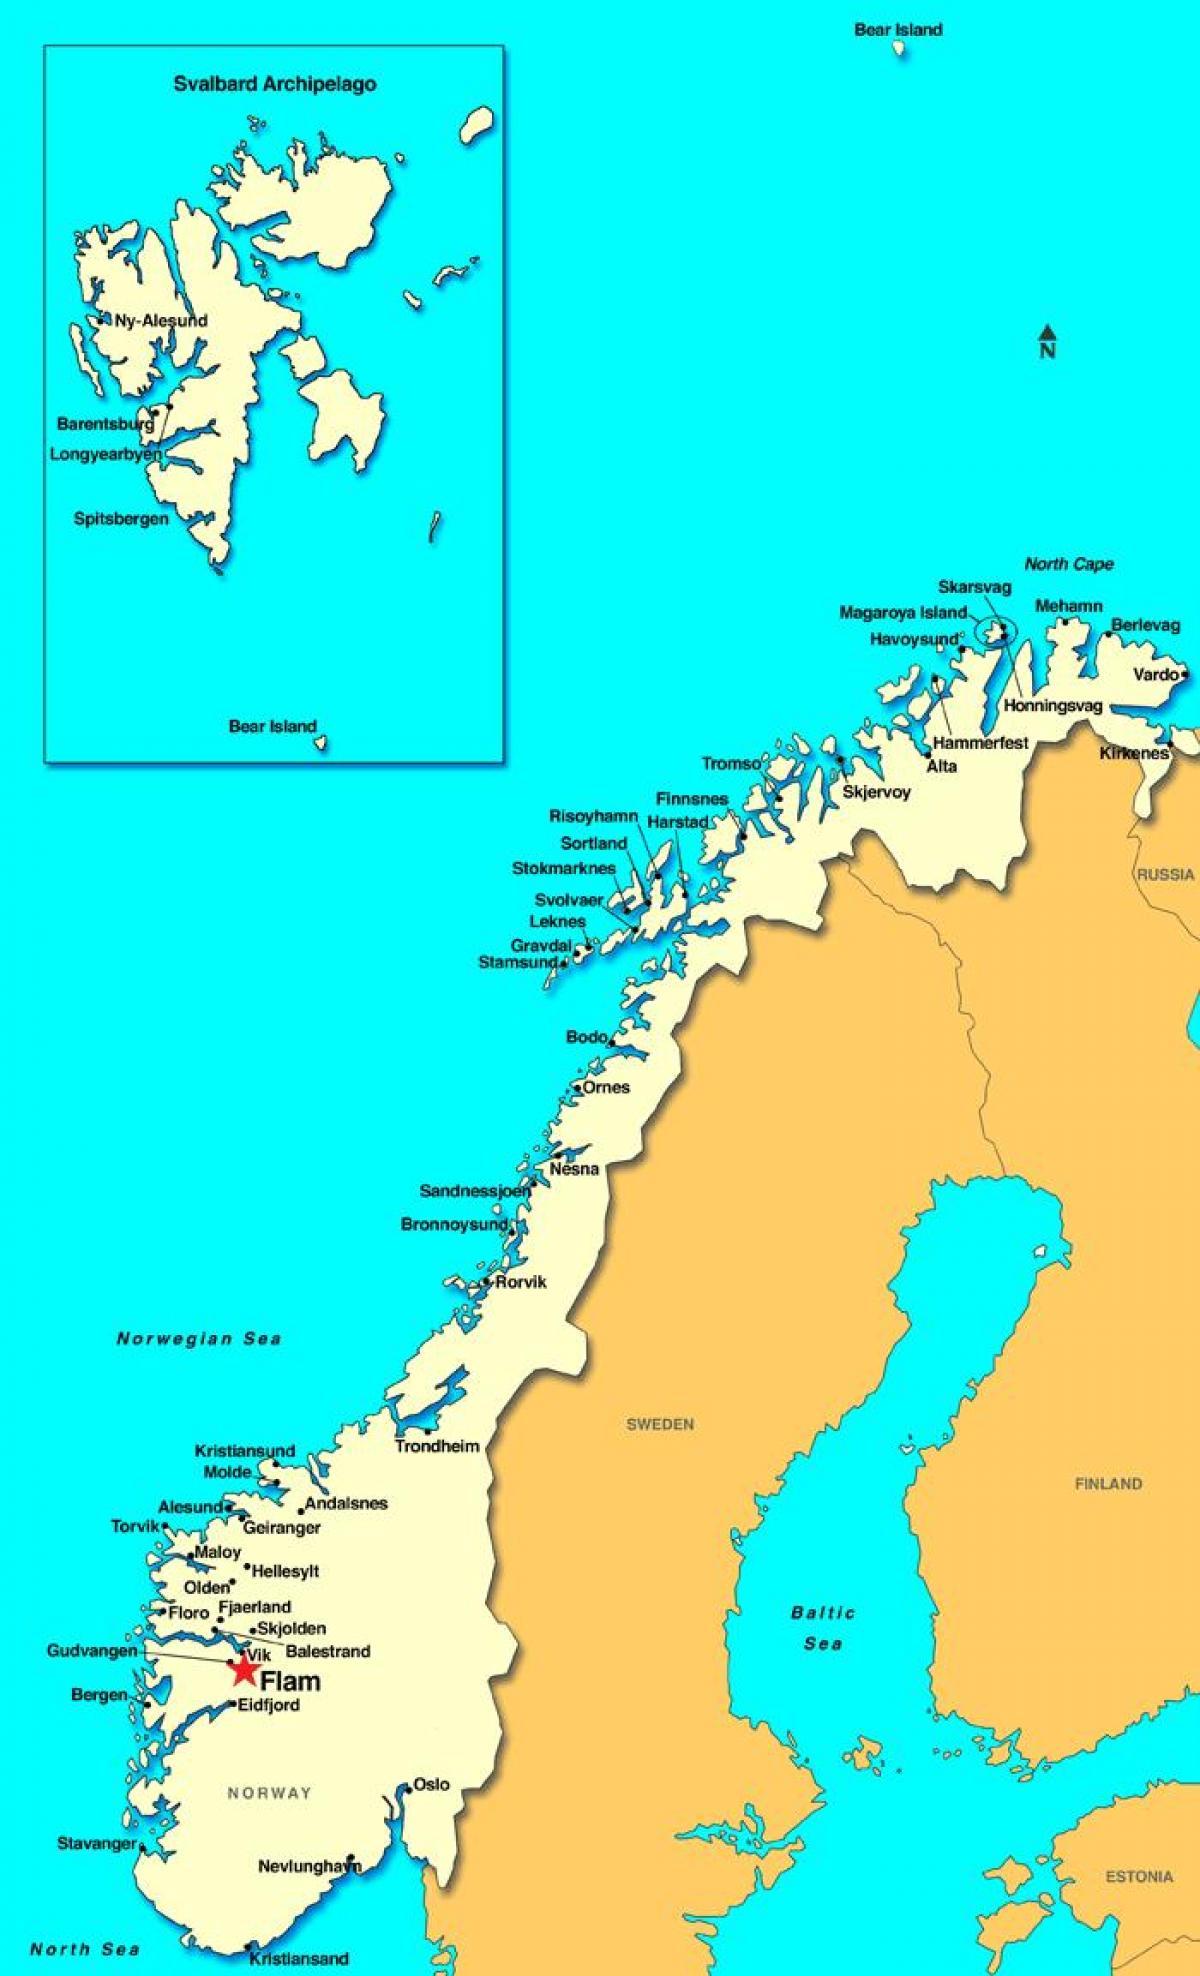 Flam Norja Kartta Flam Kartta Norja Pohjois Eurooppa Eurooppa